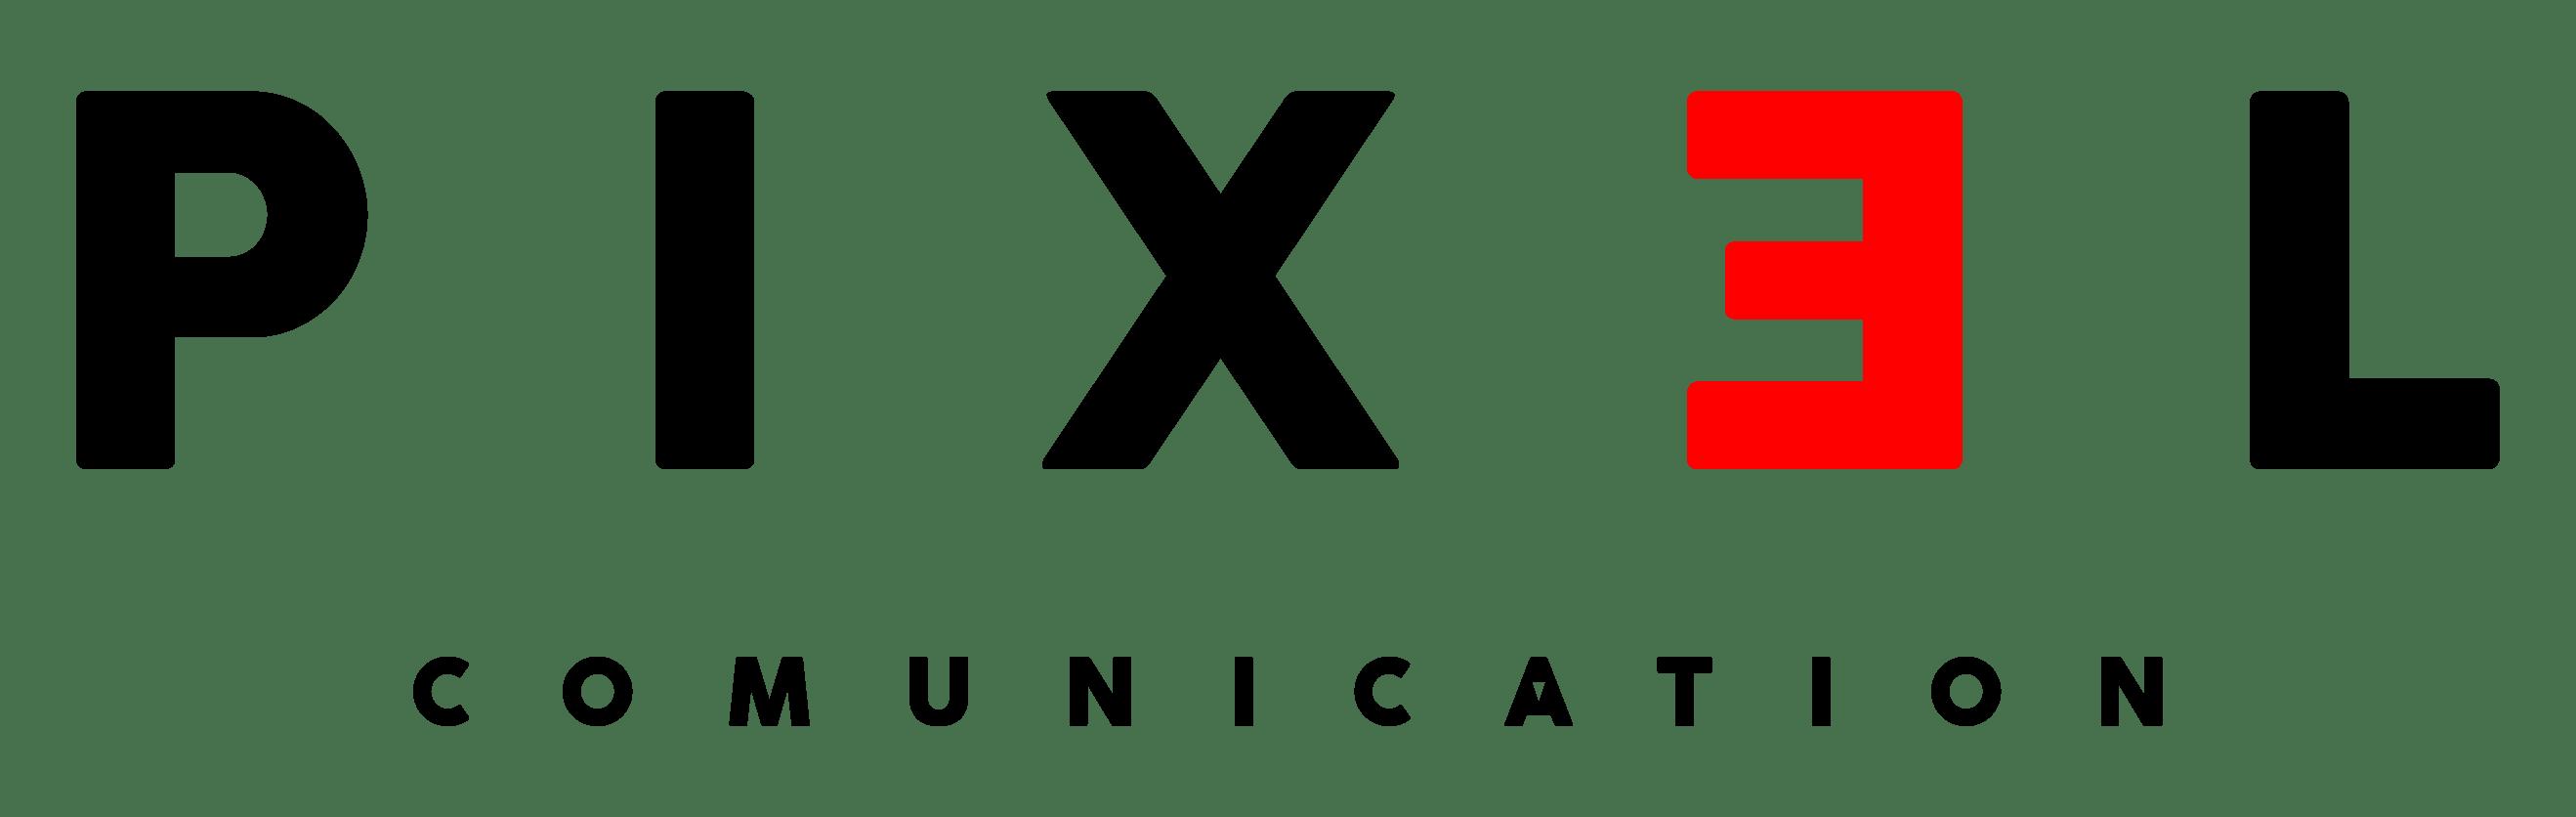 pixel comunication